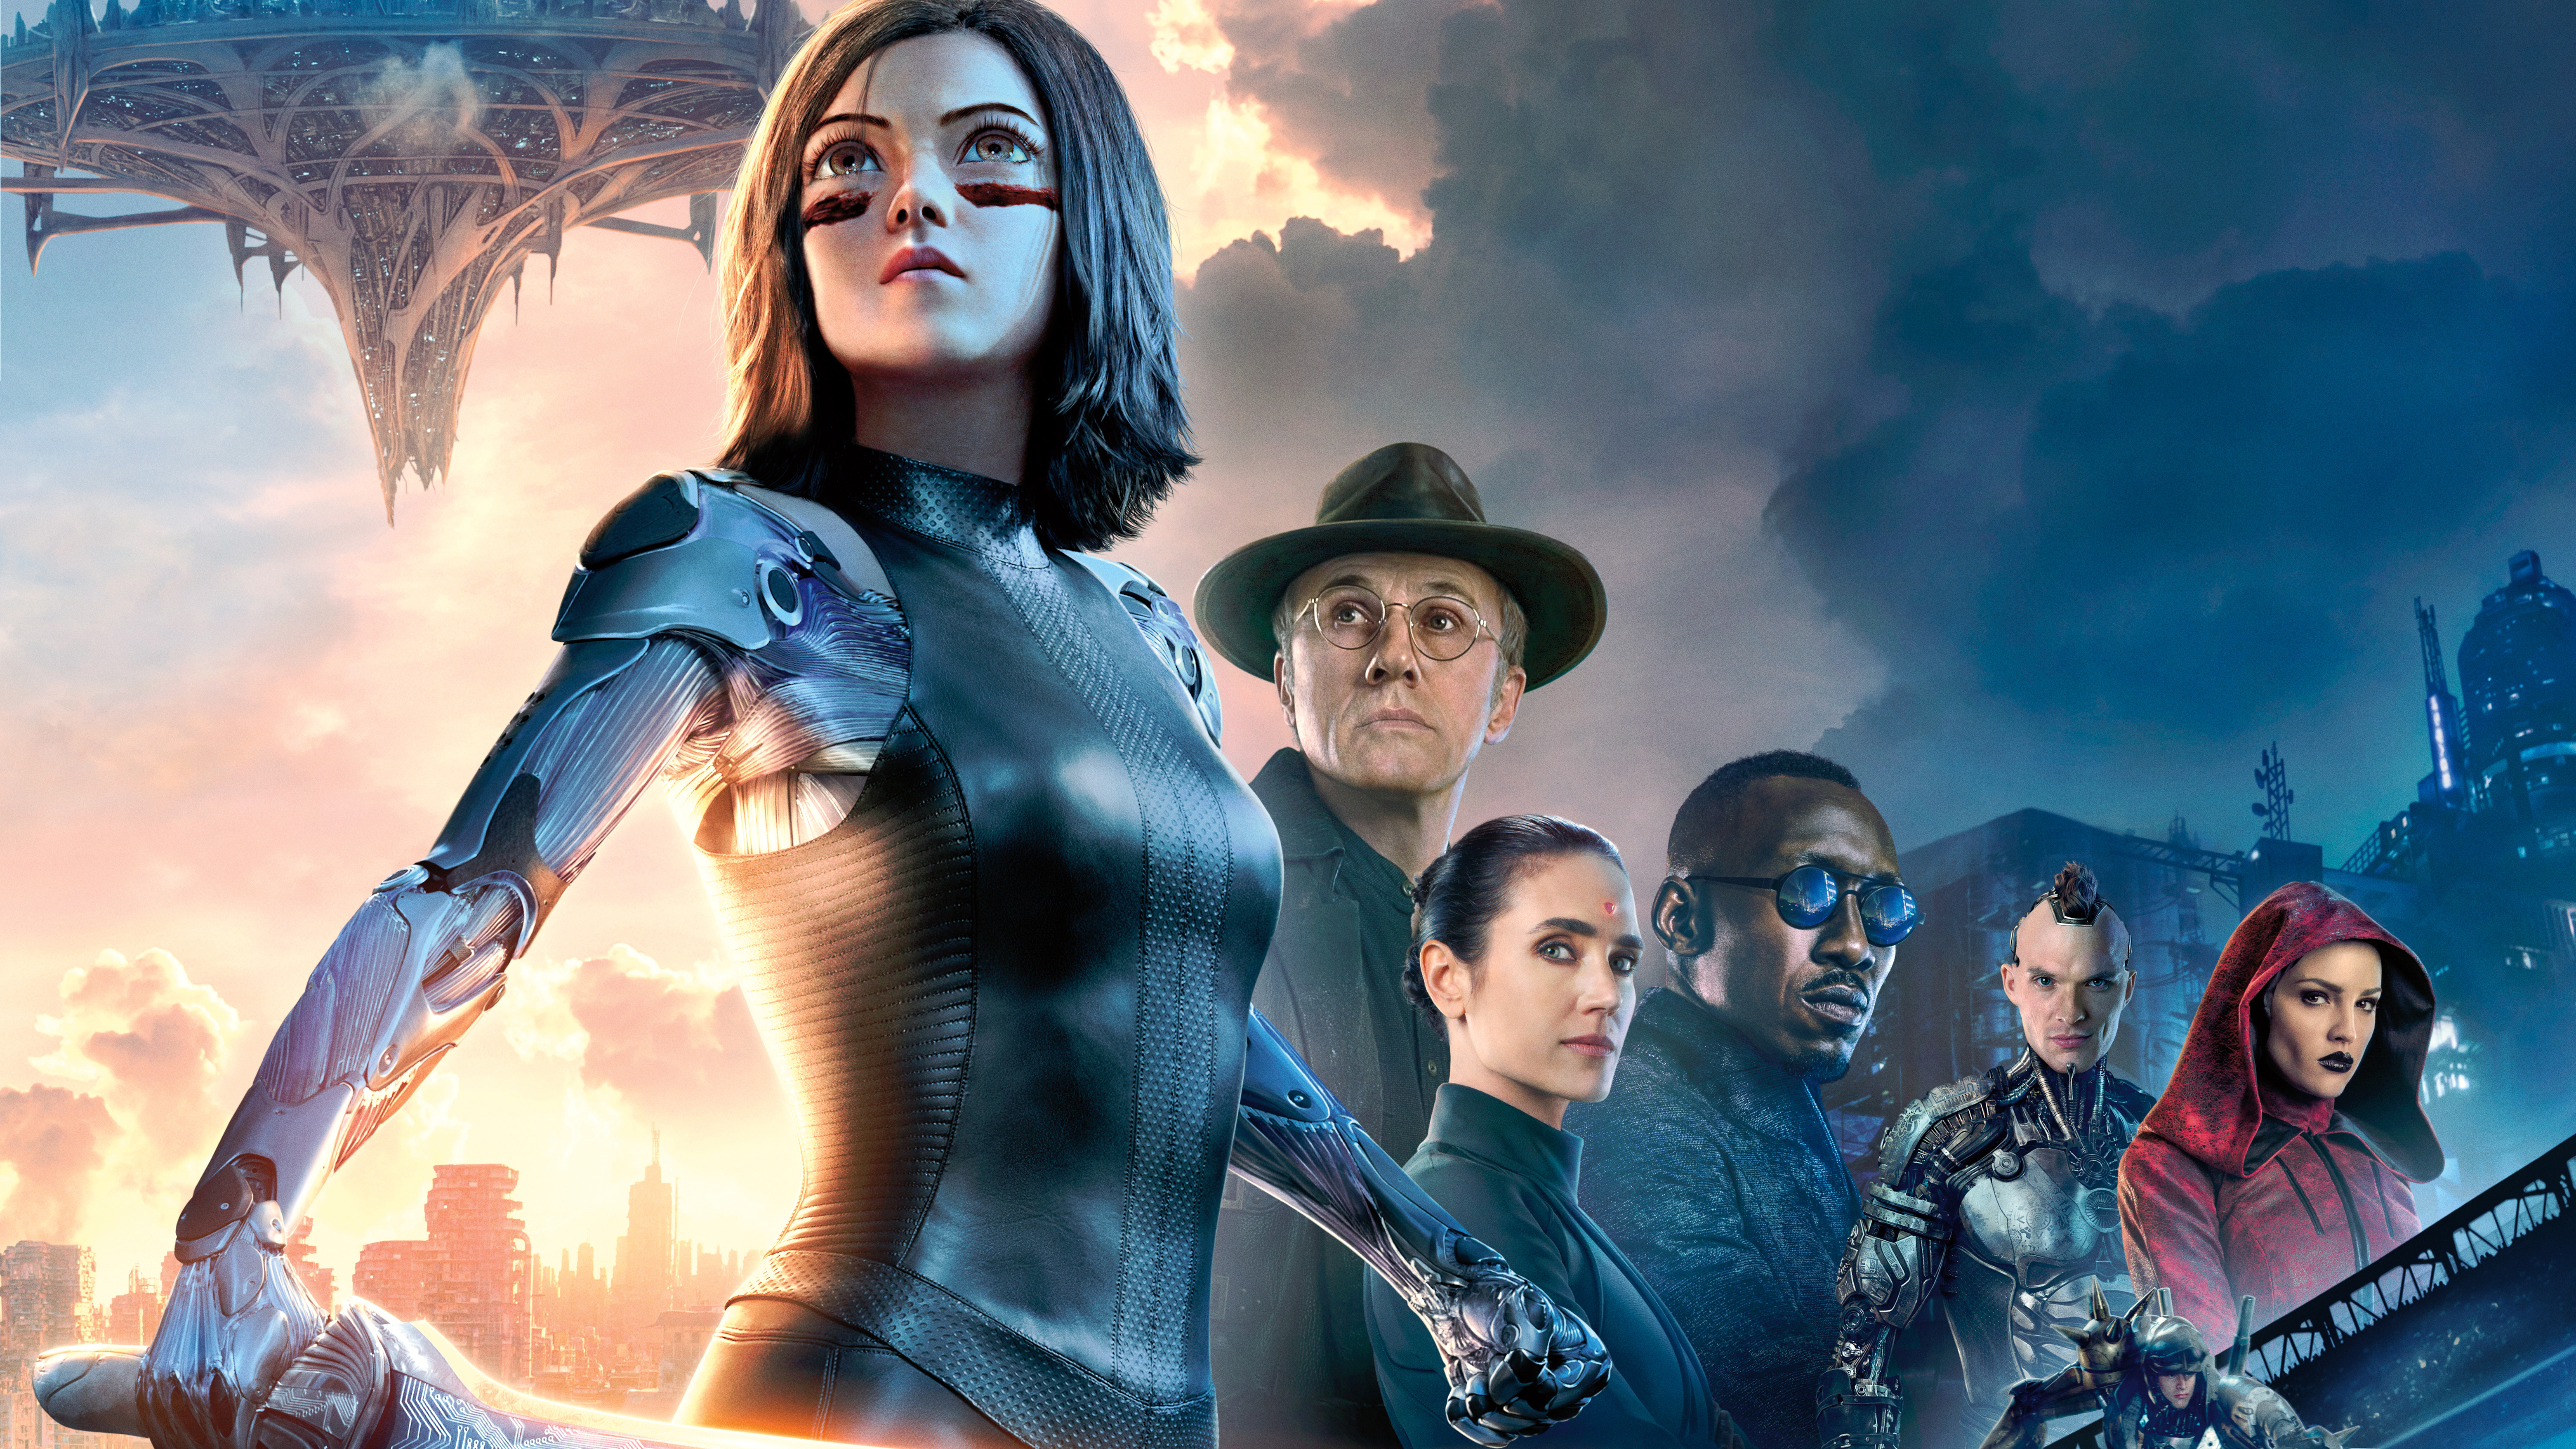 Alita Battle Angel 5k 2019 Hd Movies 4k Wallpapers Images